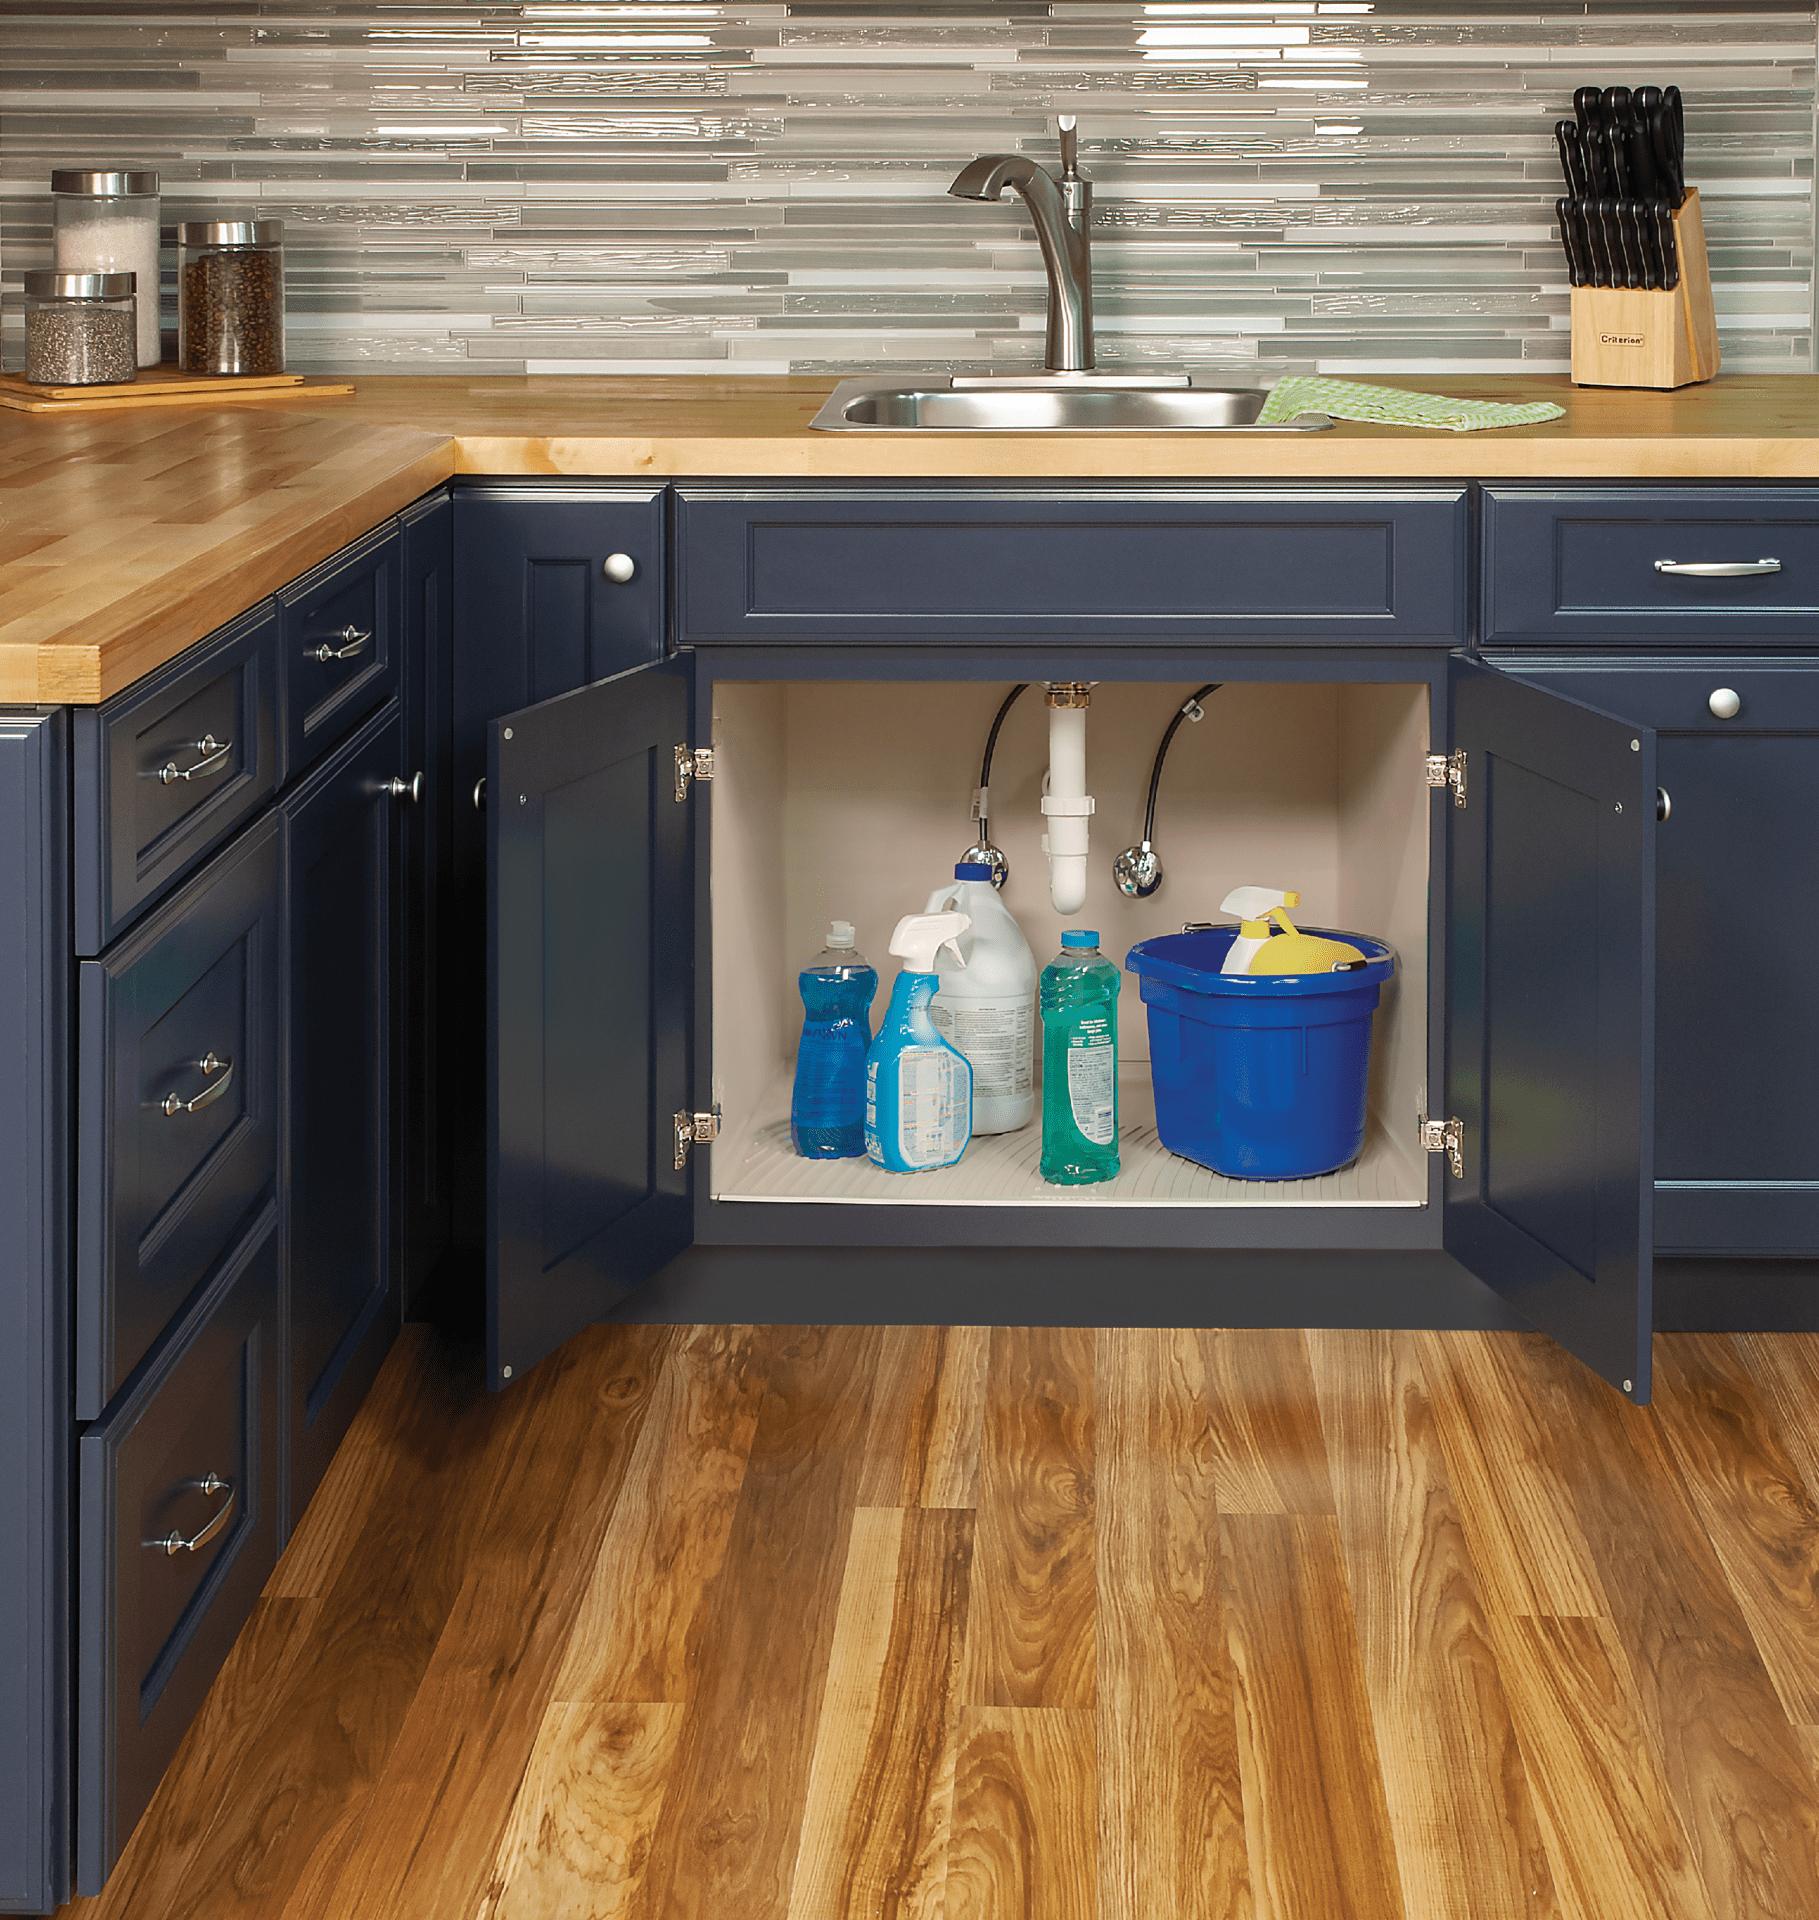 coreguard sink base cardell kitchen